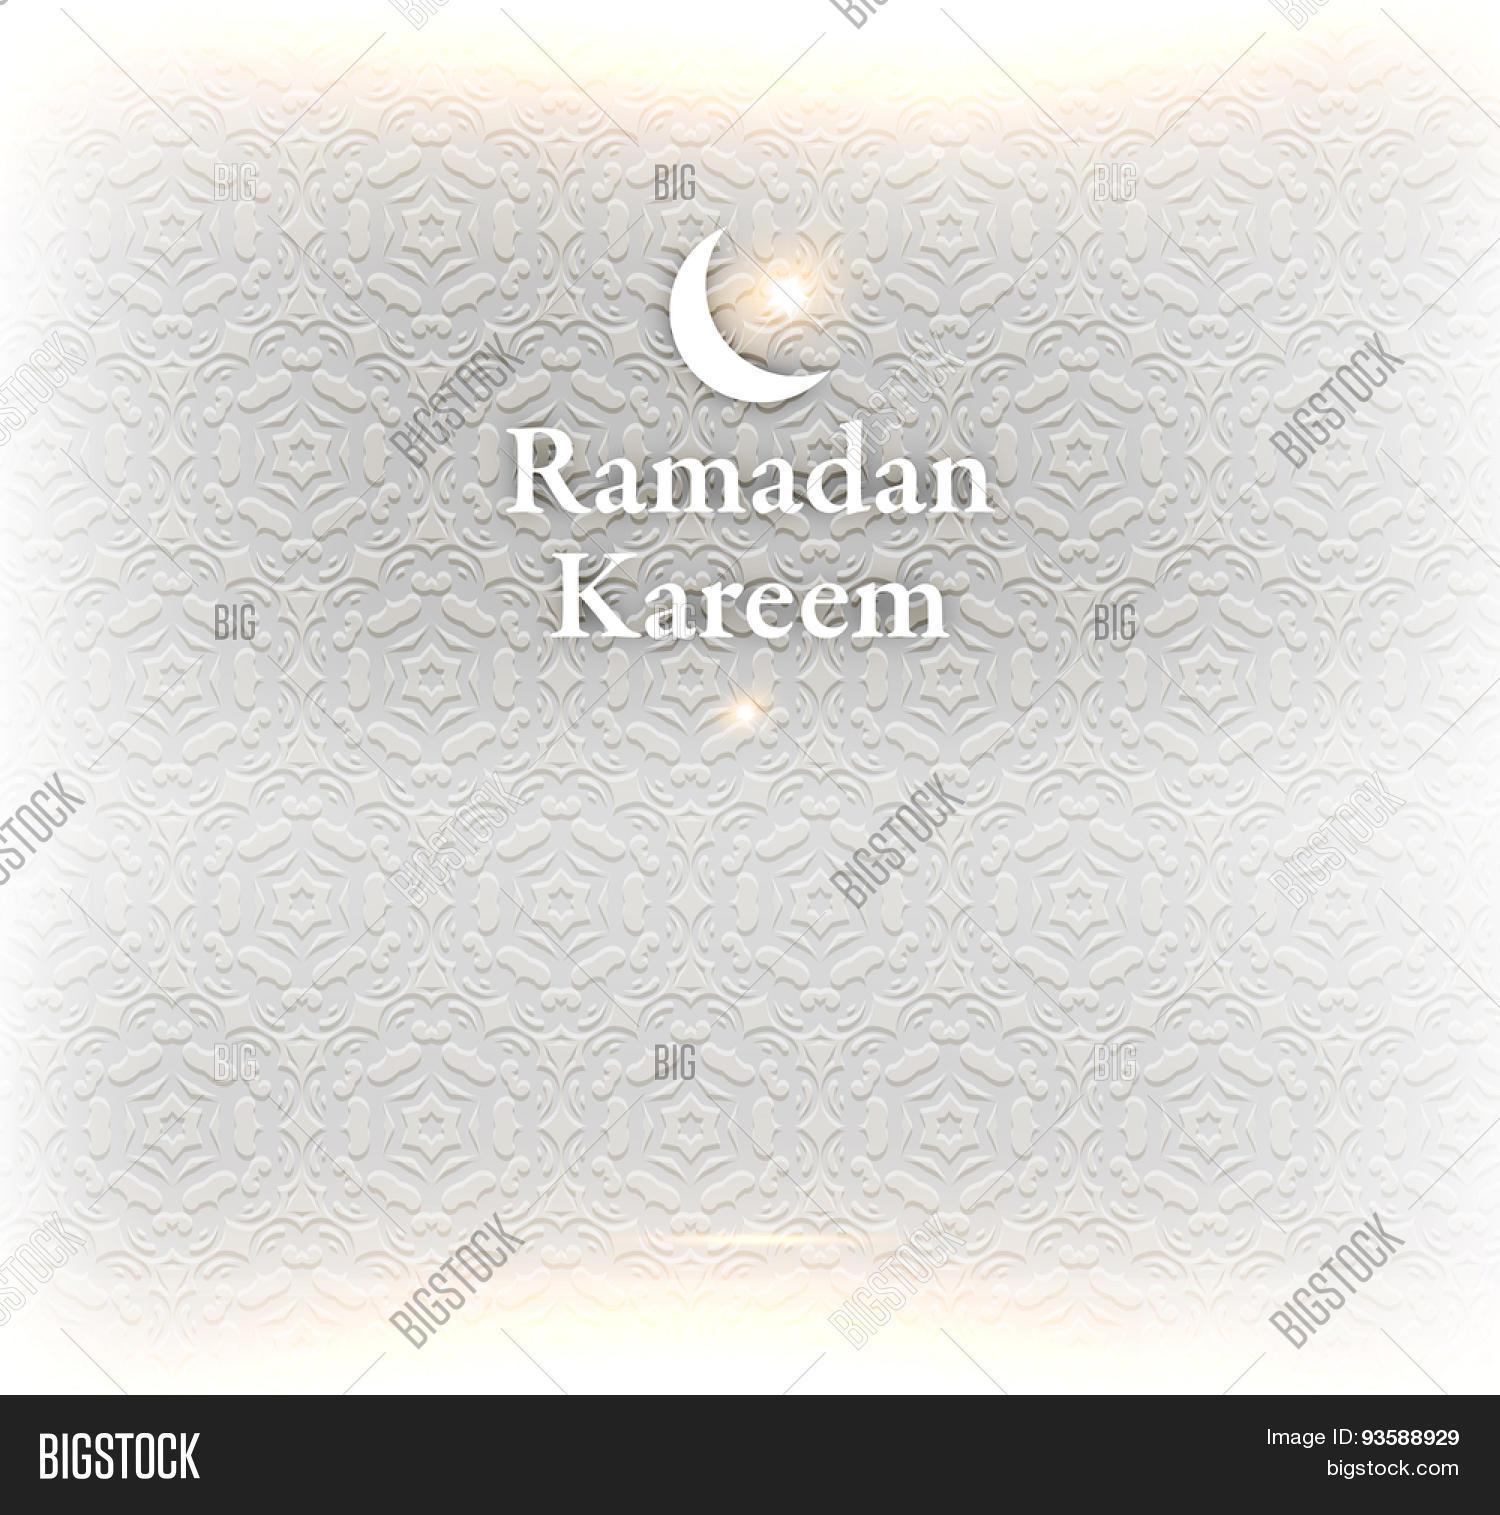 Ramadan kareem ramadan greeting vector photo bigstock ramadan greeting card background muslim pattern holiday design kristyandbryce Images